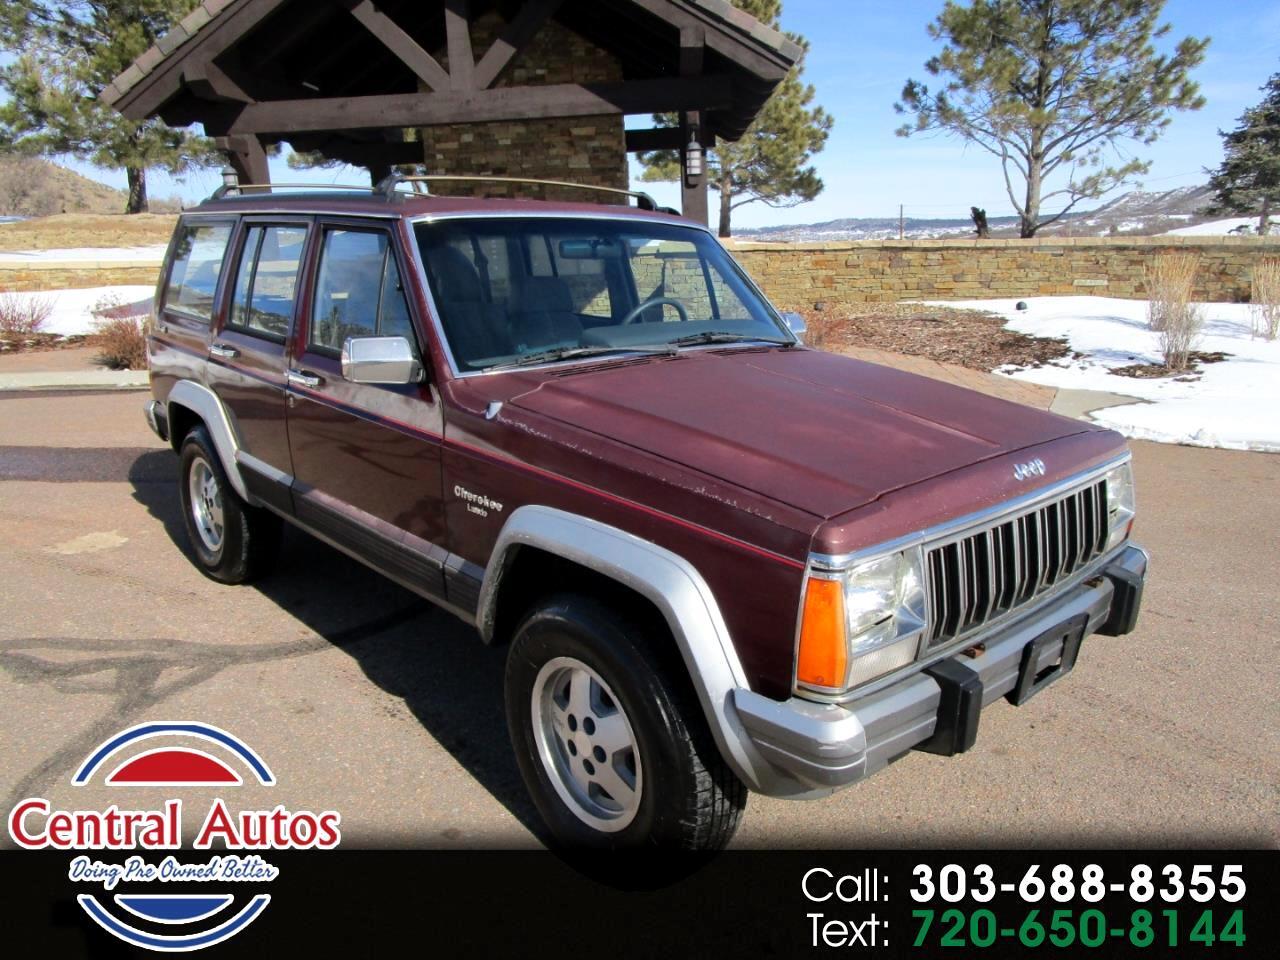 1992 Jeep Cherokee 4dr Wagon Laredo 4WD